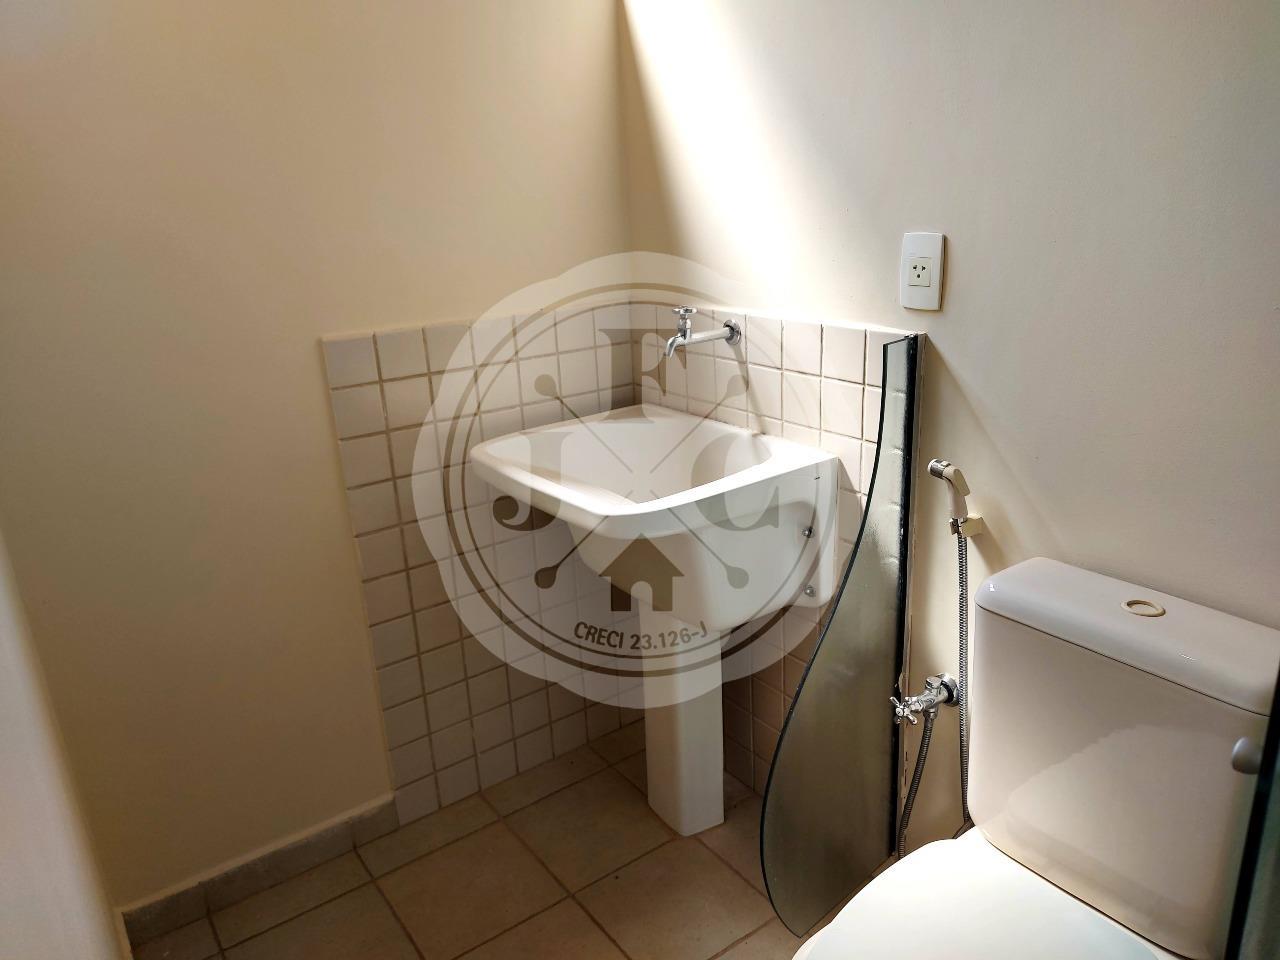 Kitnet para aluguel no Vila Amélia: Banheiro